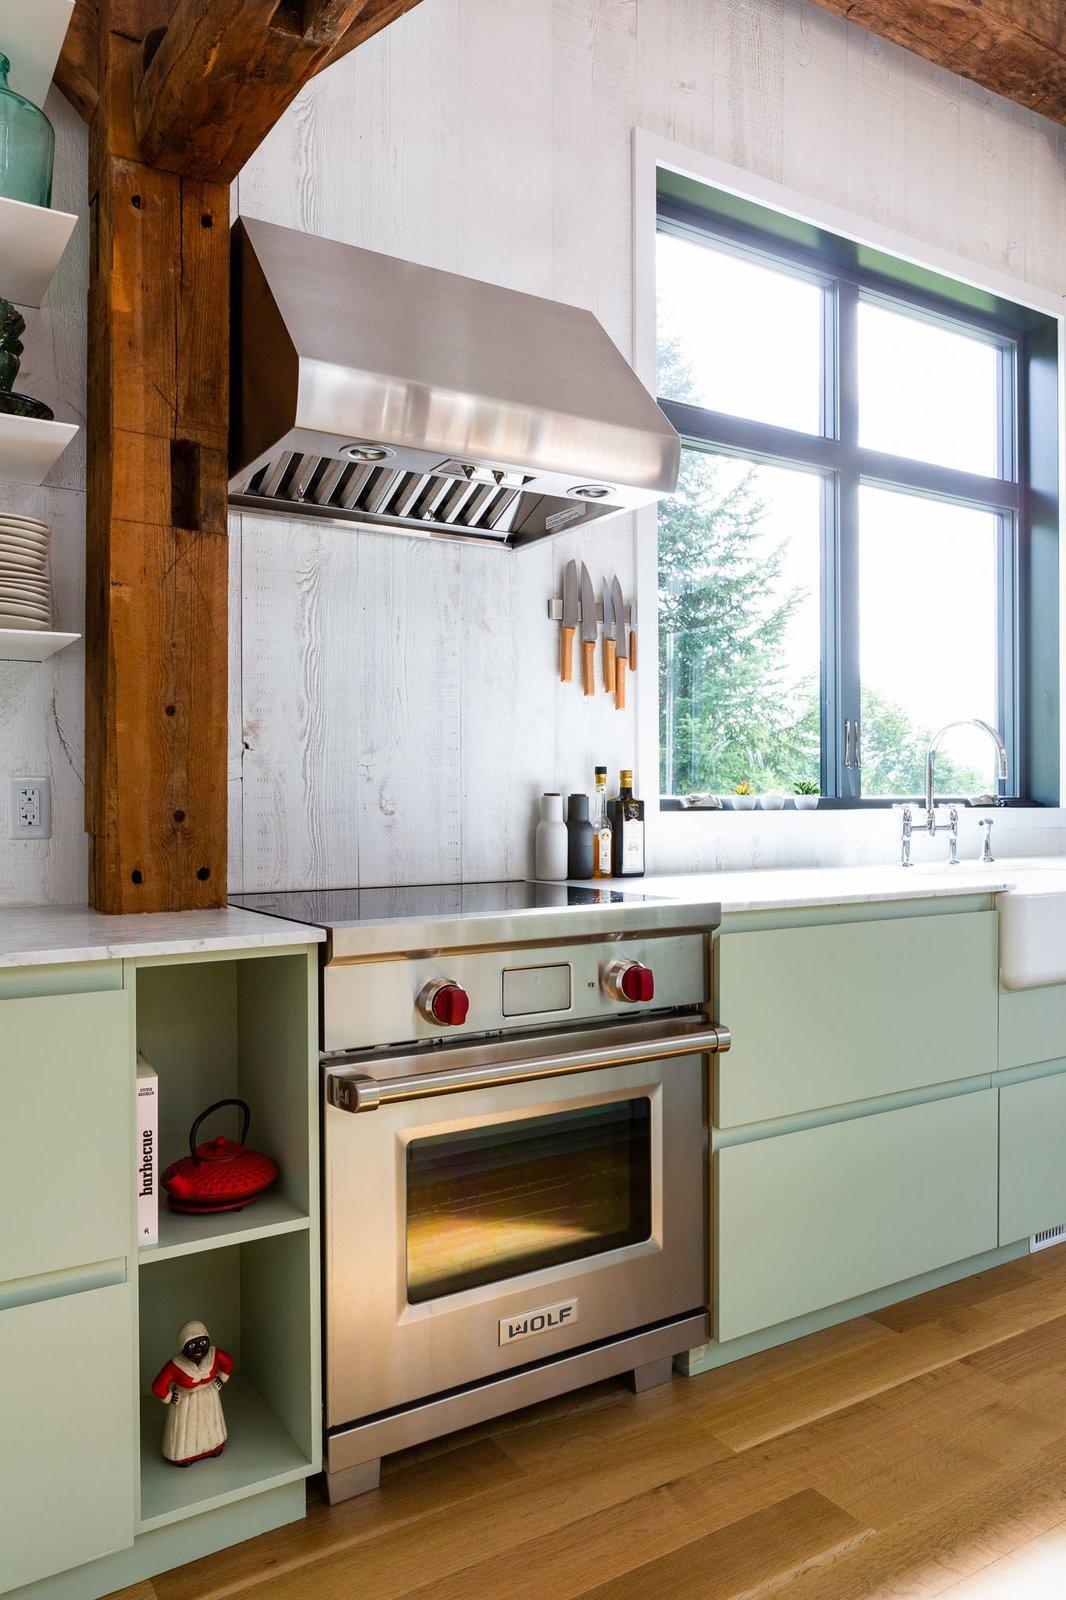 Kitchen, Vessel Sink, Wood Backsplashe, Medium Hardwood Floor, Range, Marble Counter, Range Hood, Colorful Cabinet, and Undermount Sink  The Barn